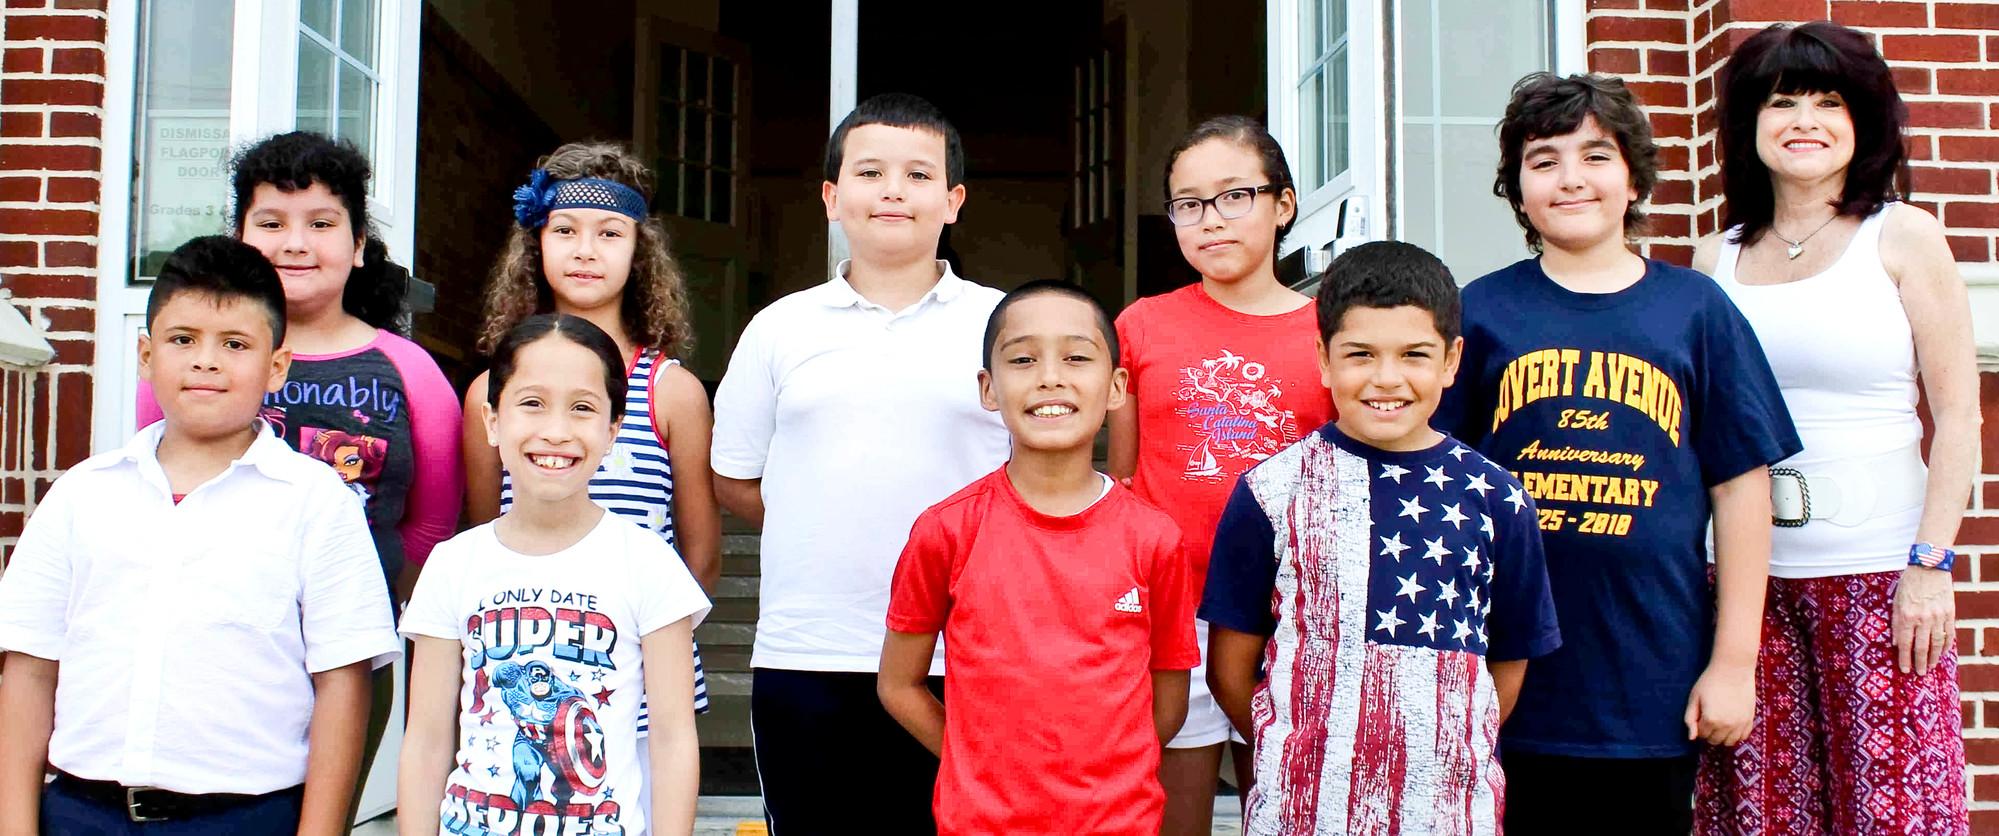 Covert Avenue Celebrates Flag Day